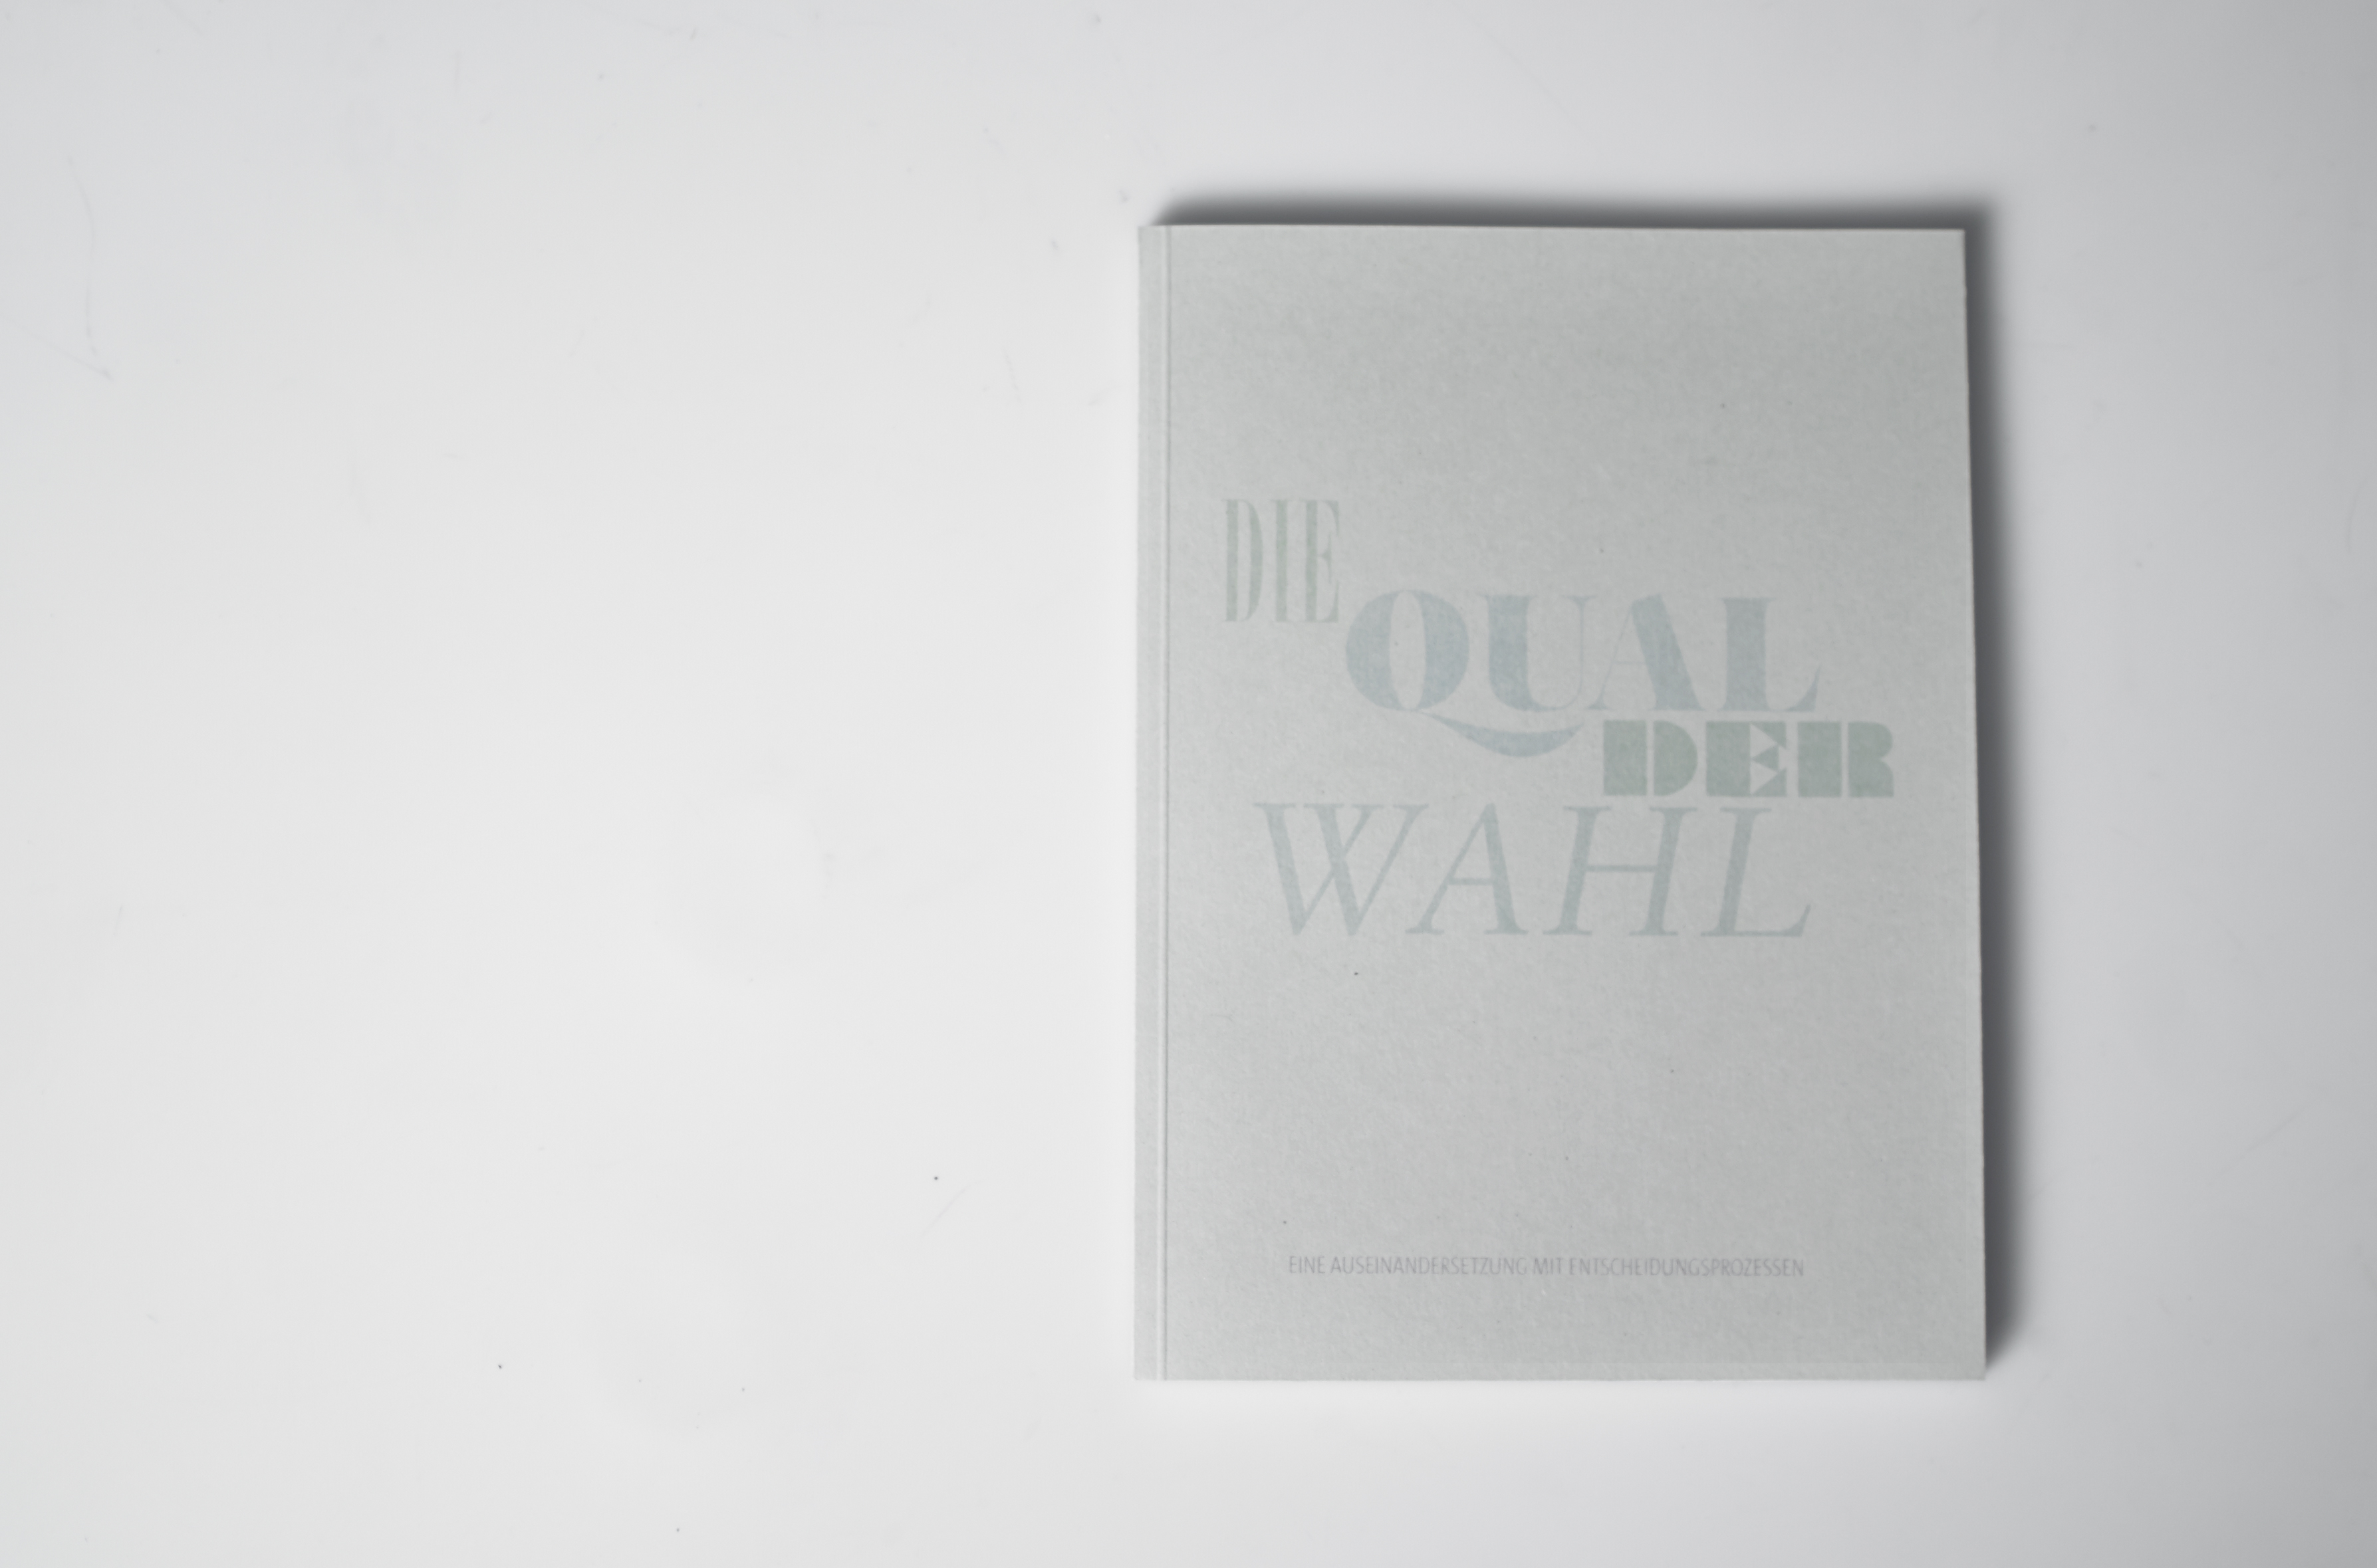 Qual_der_Wahl_cover